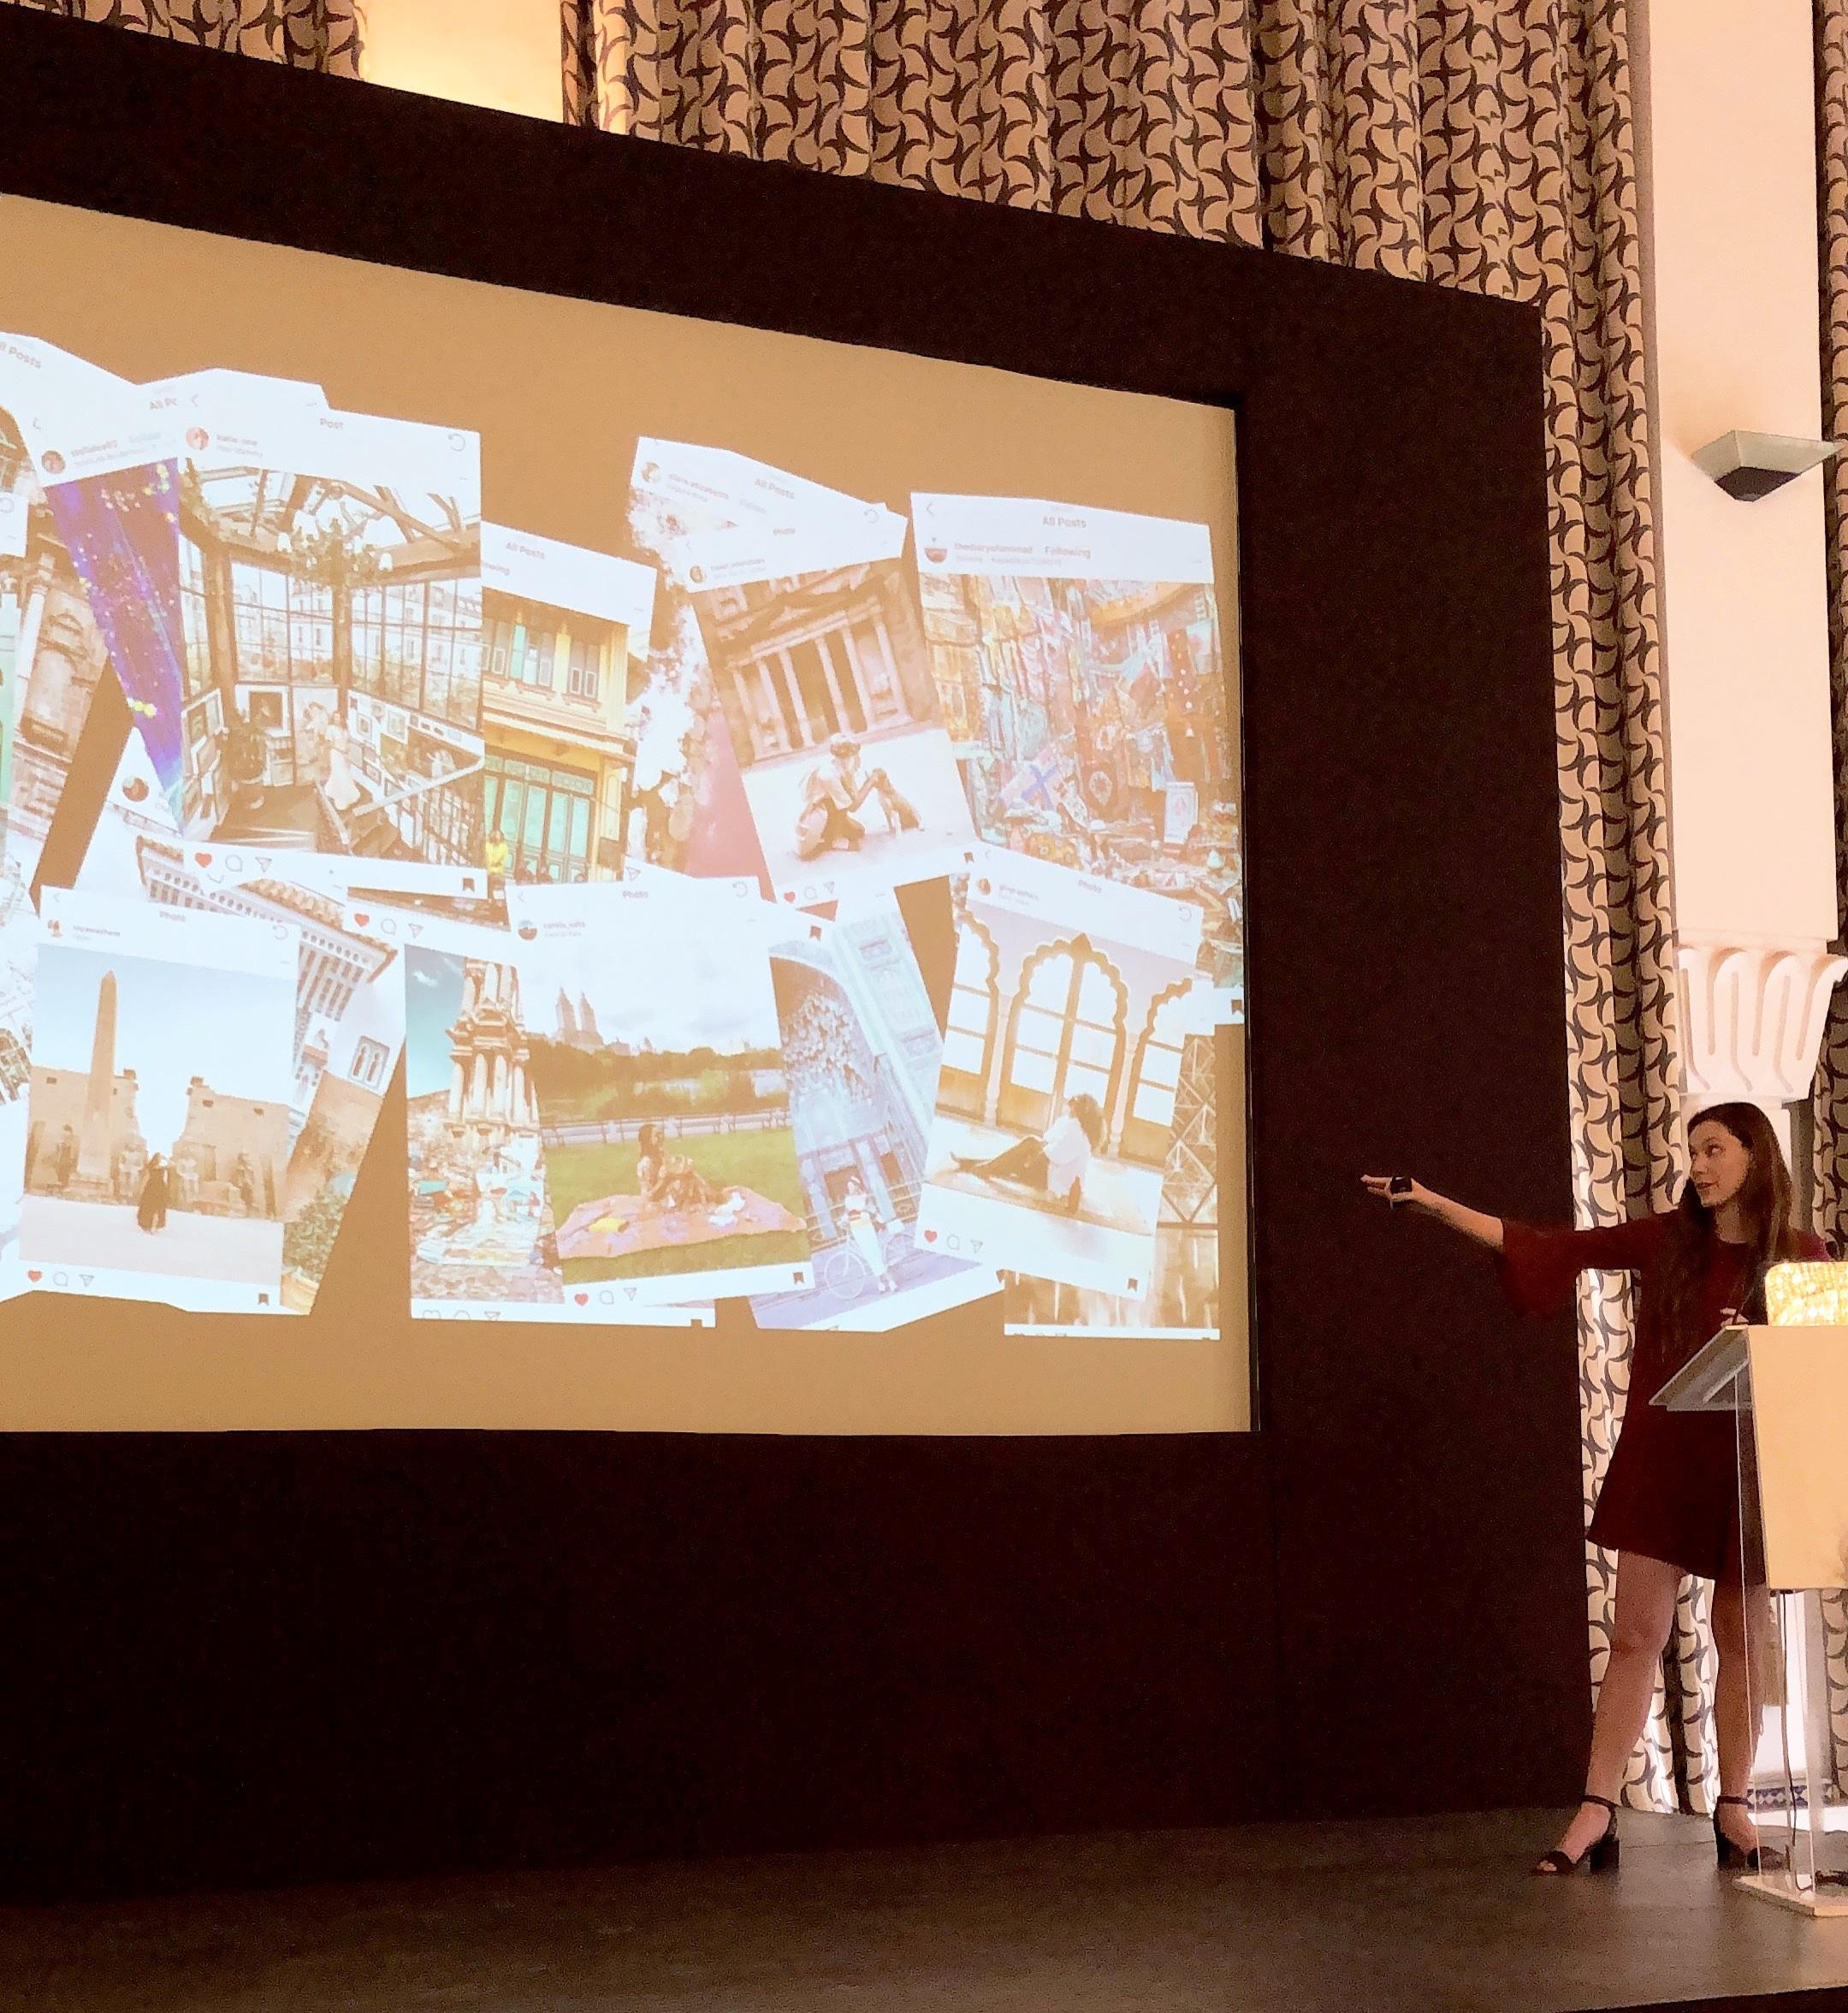 Carina Otero speaking on Influencer Marketing through Community Growth.